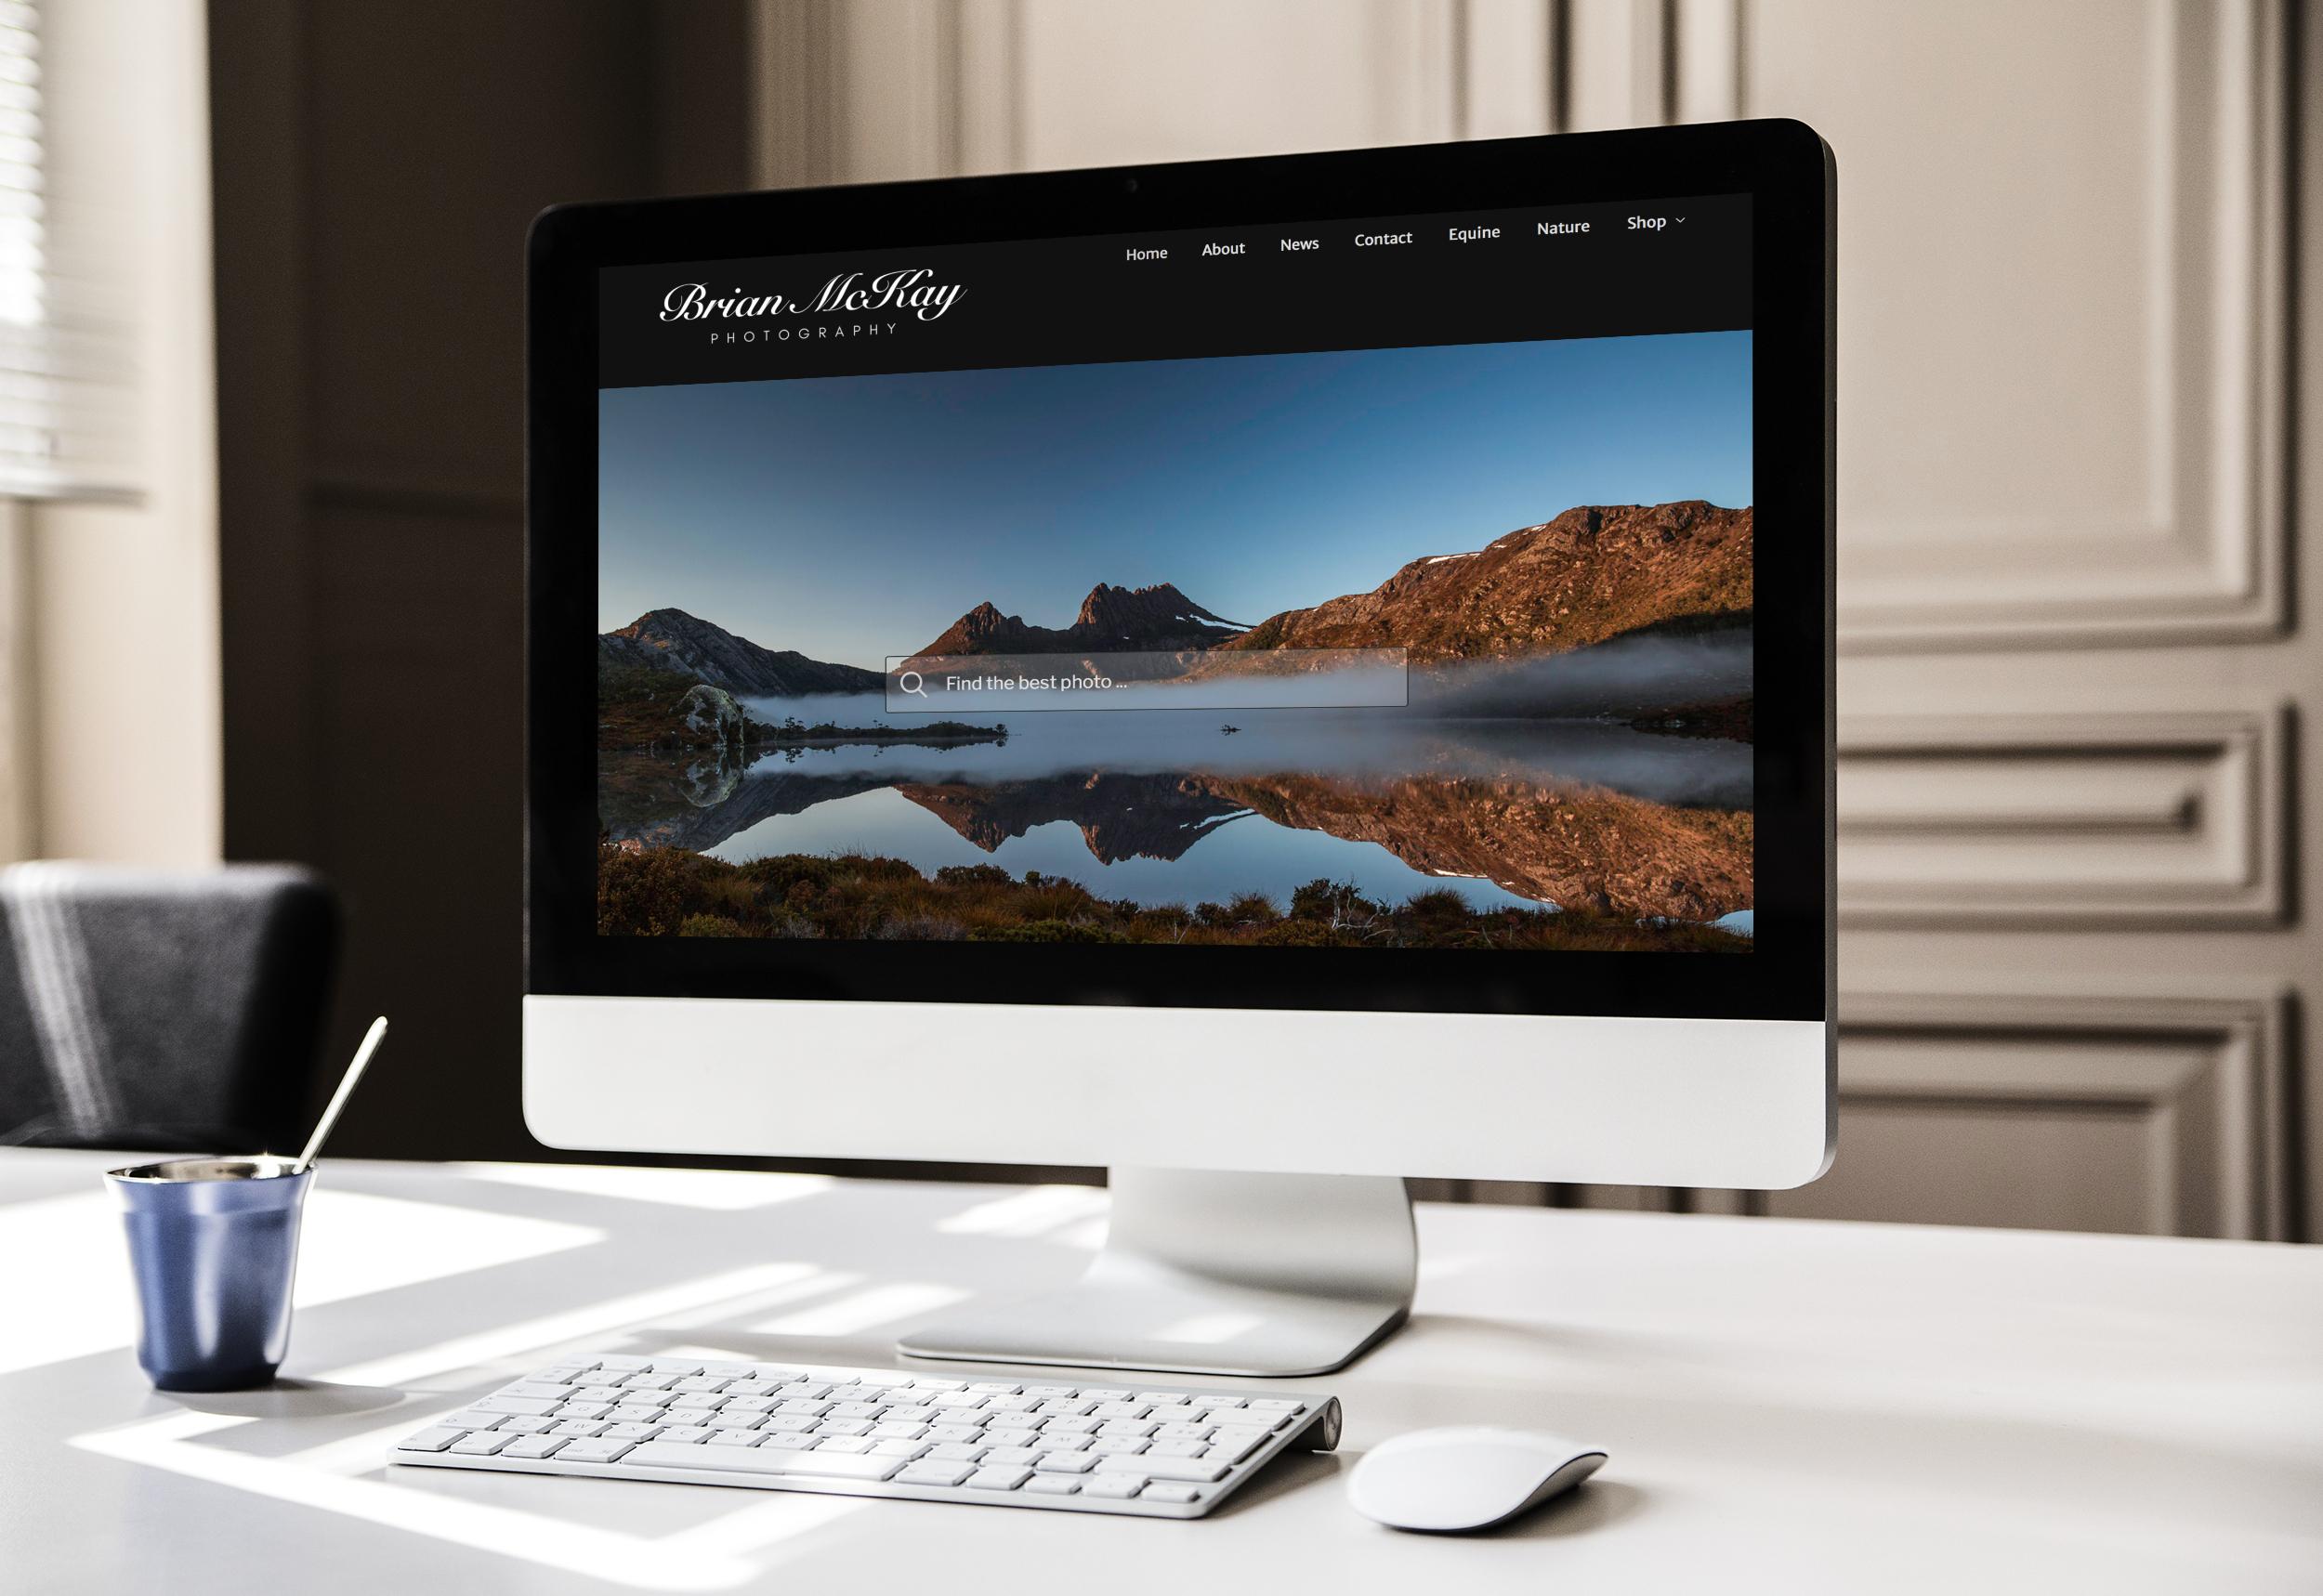 photography-website-photographer-sell-photos-online.jpg